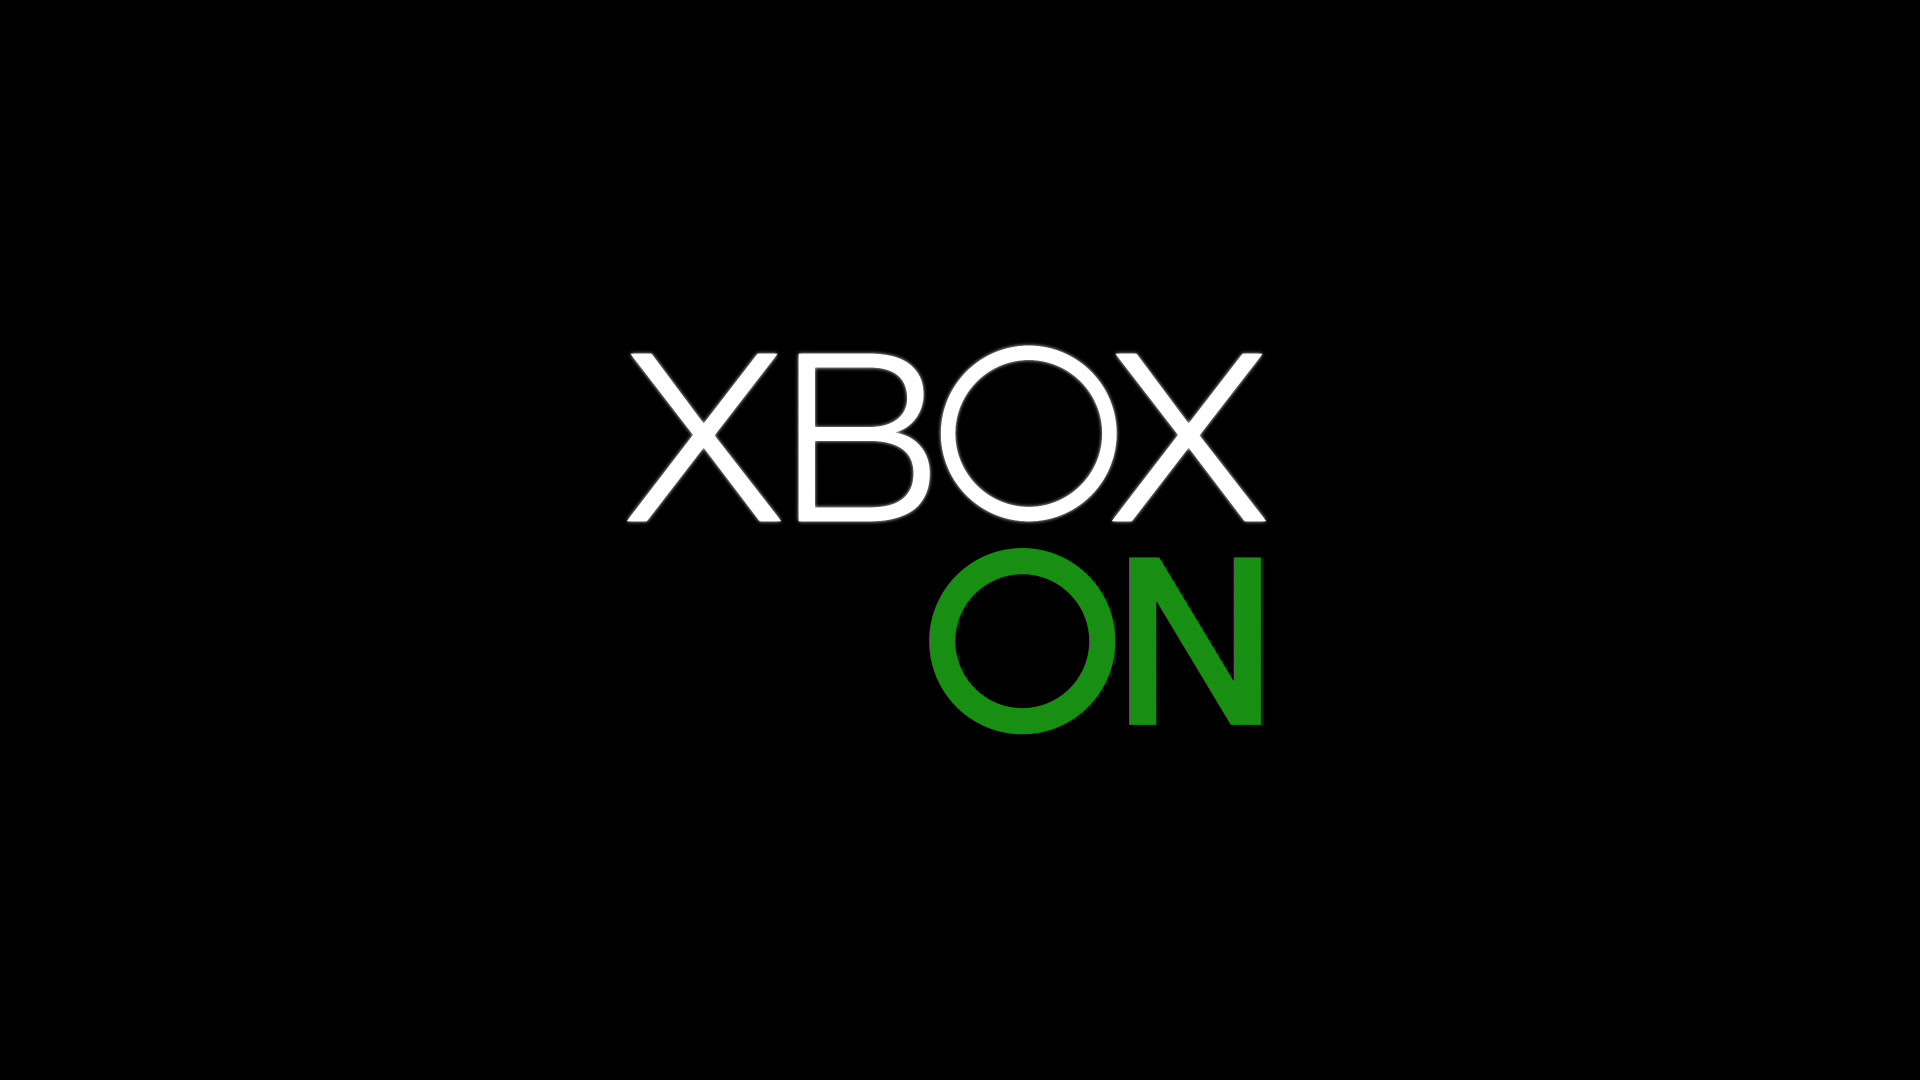 Xbox On Sting